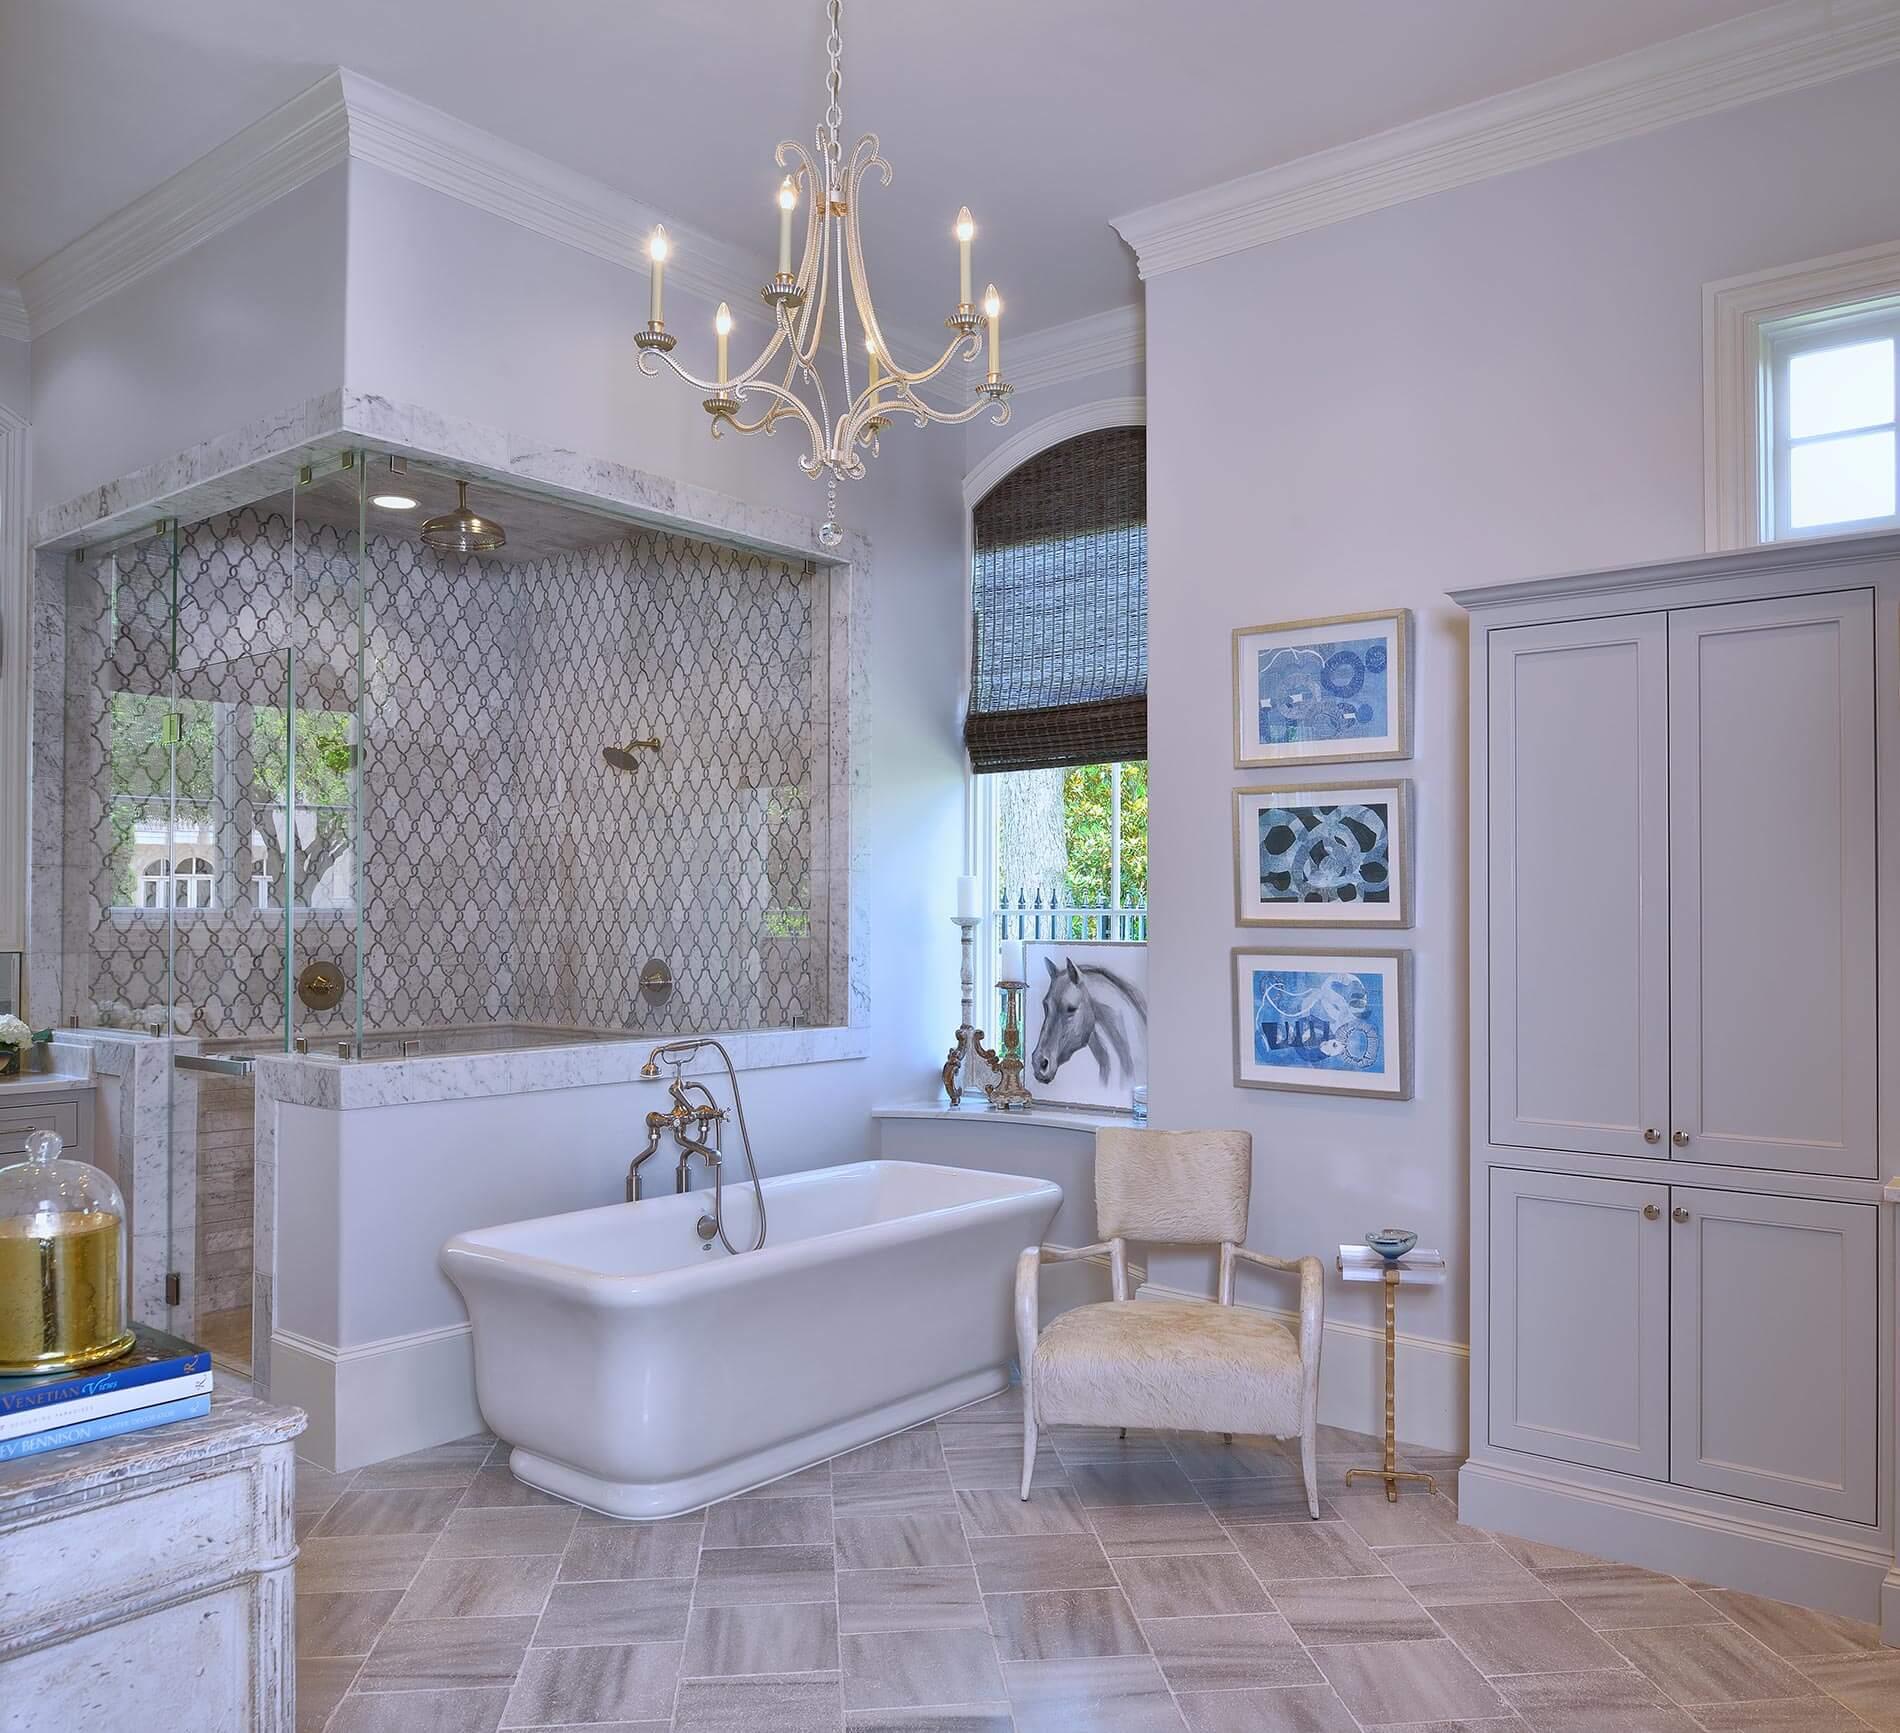 french manor bathroom interior styling